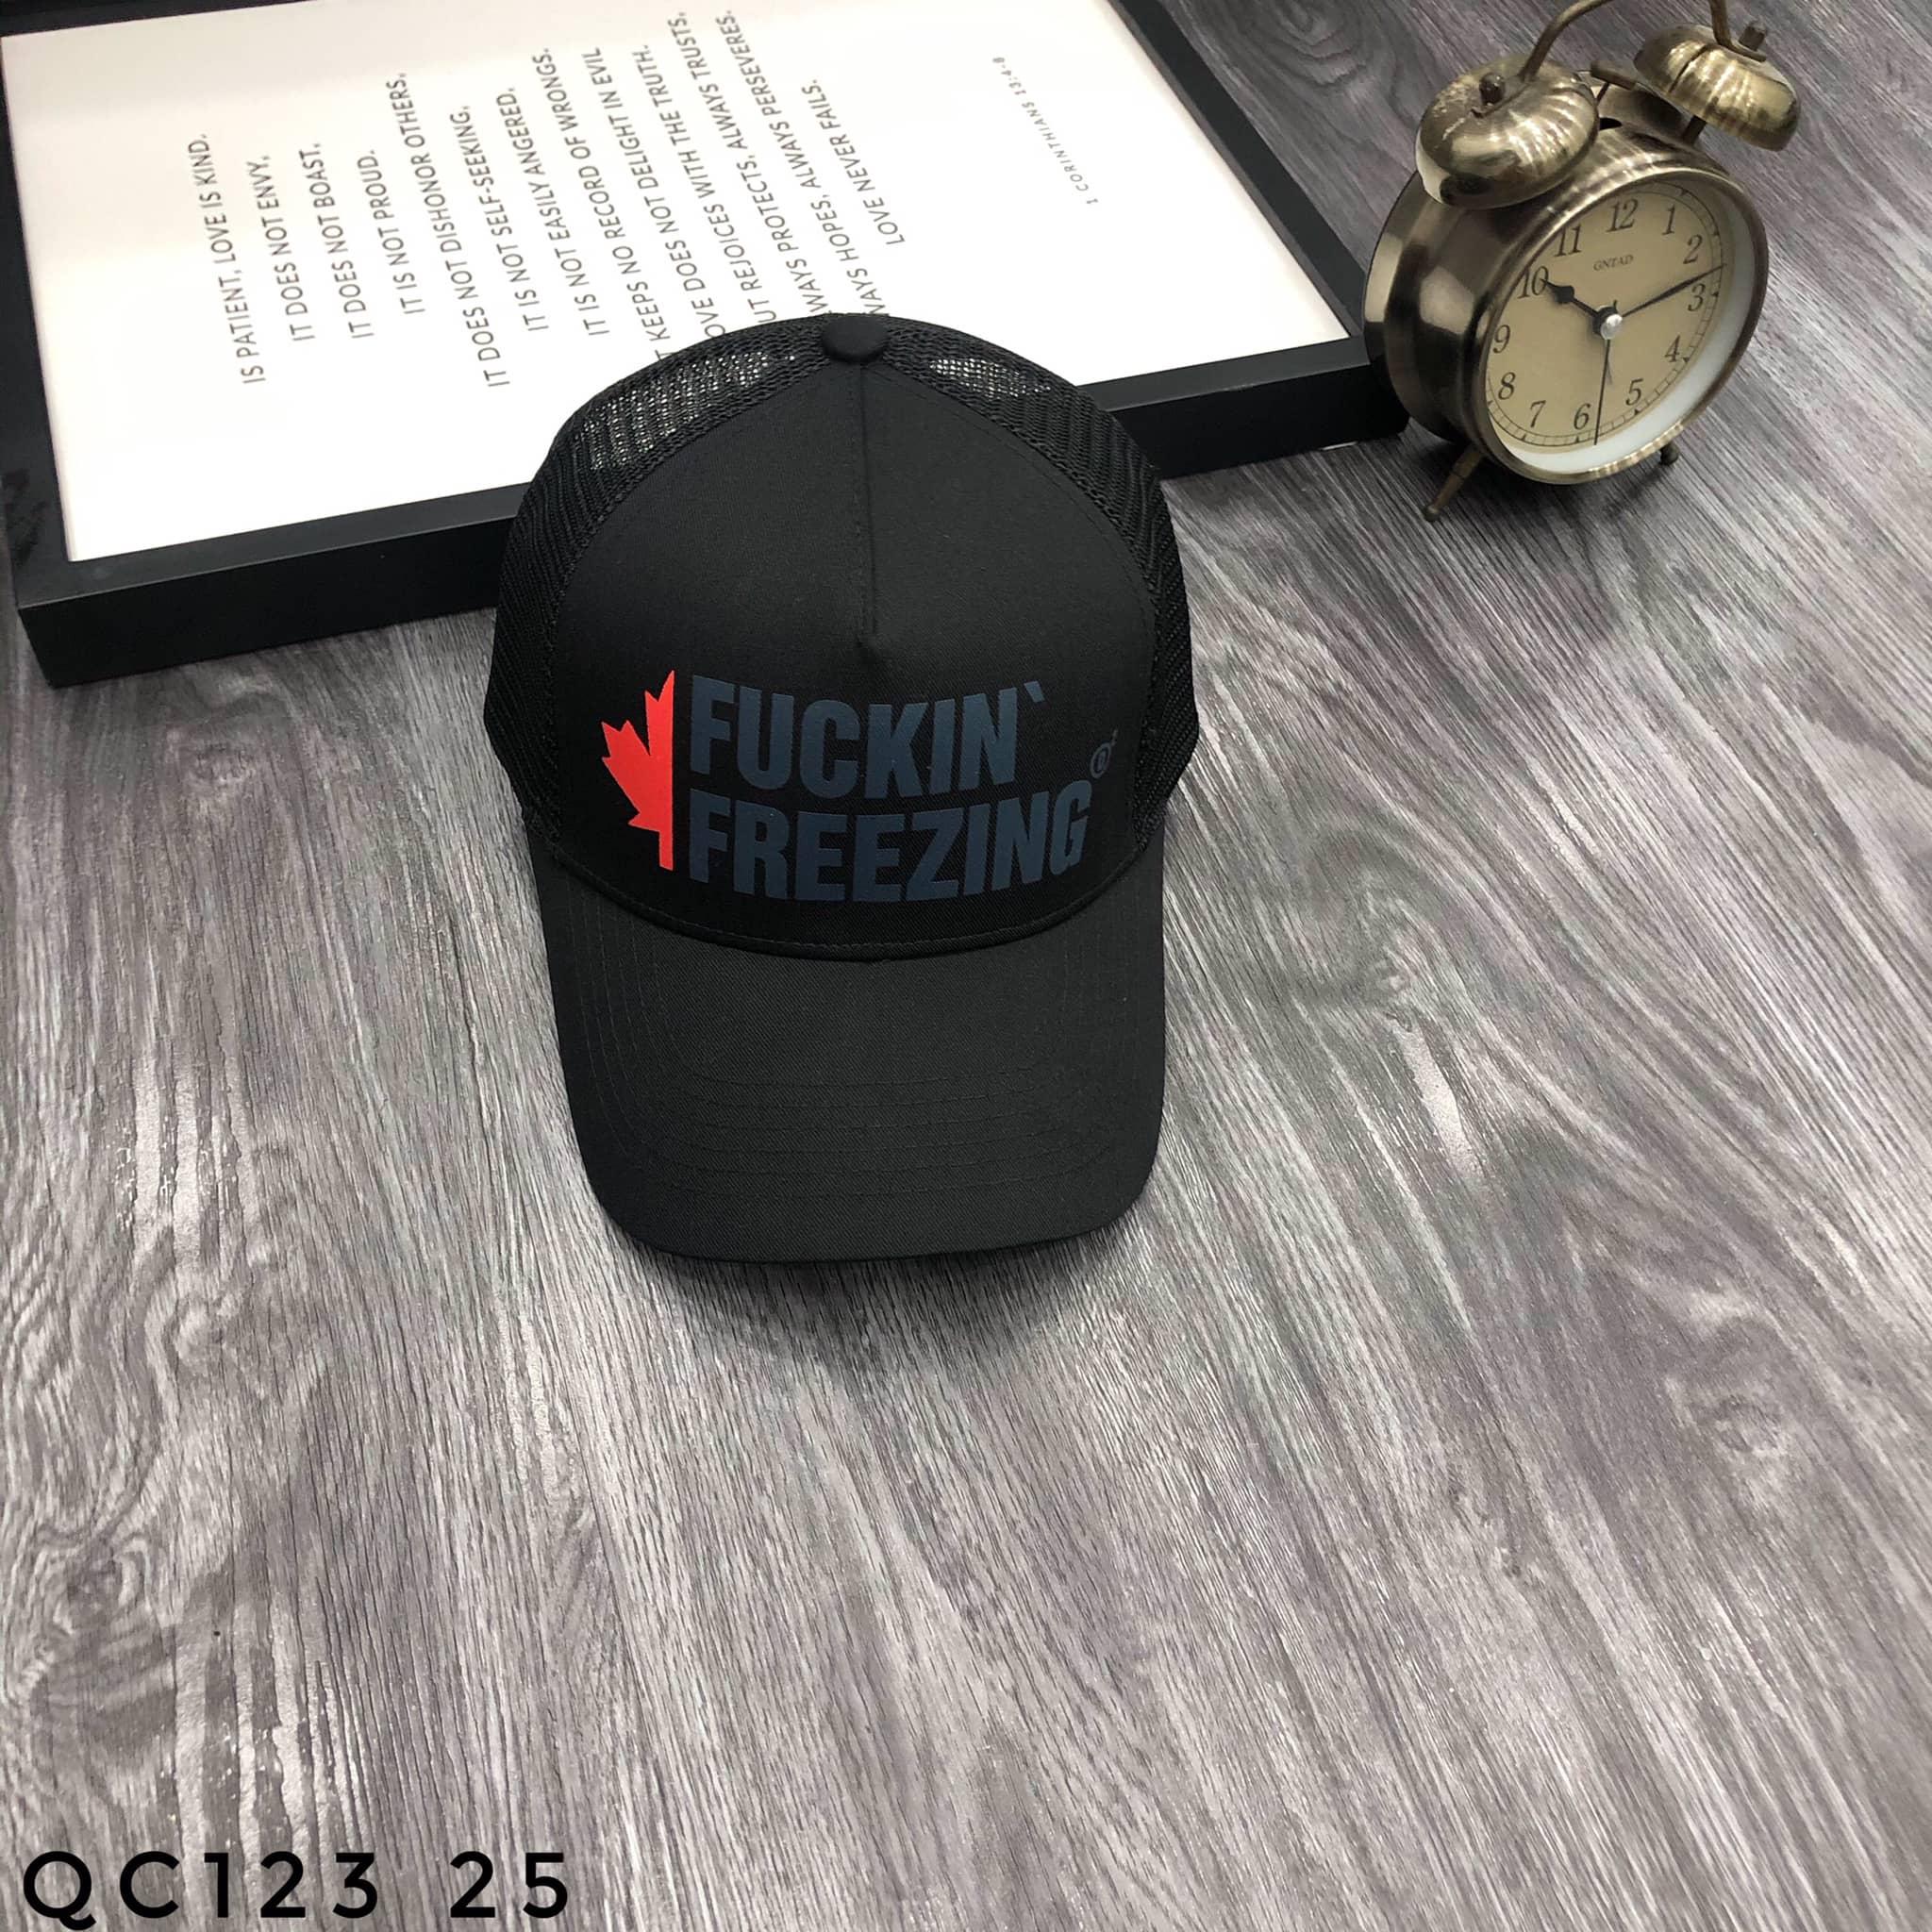 NÓN QC123